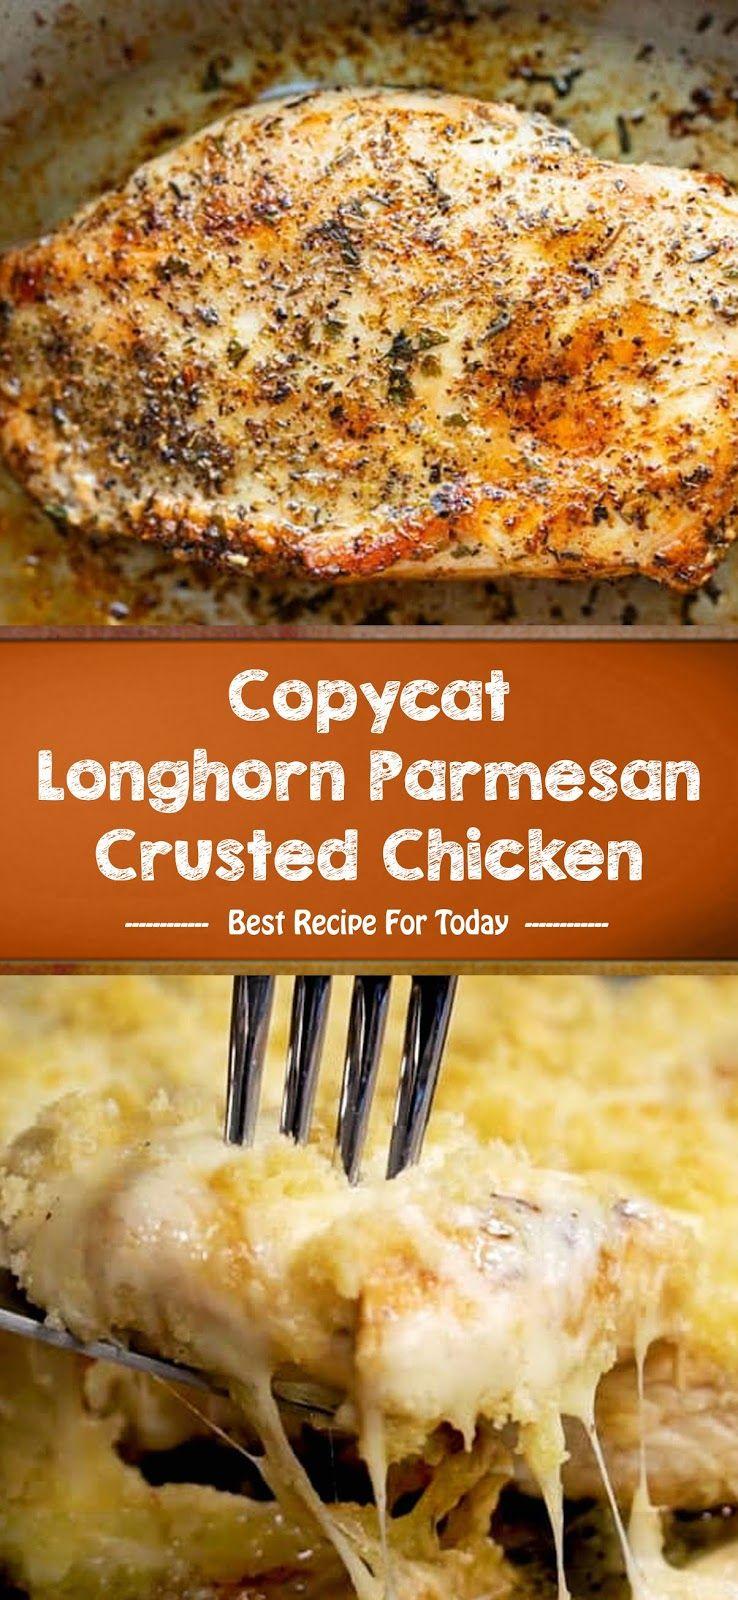 Copycat Longhorn Parmesan Crusted Chicken